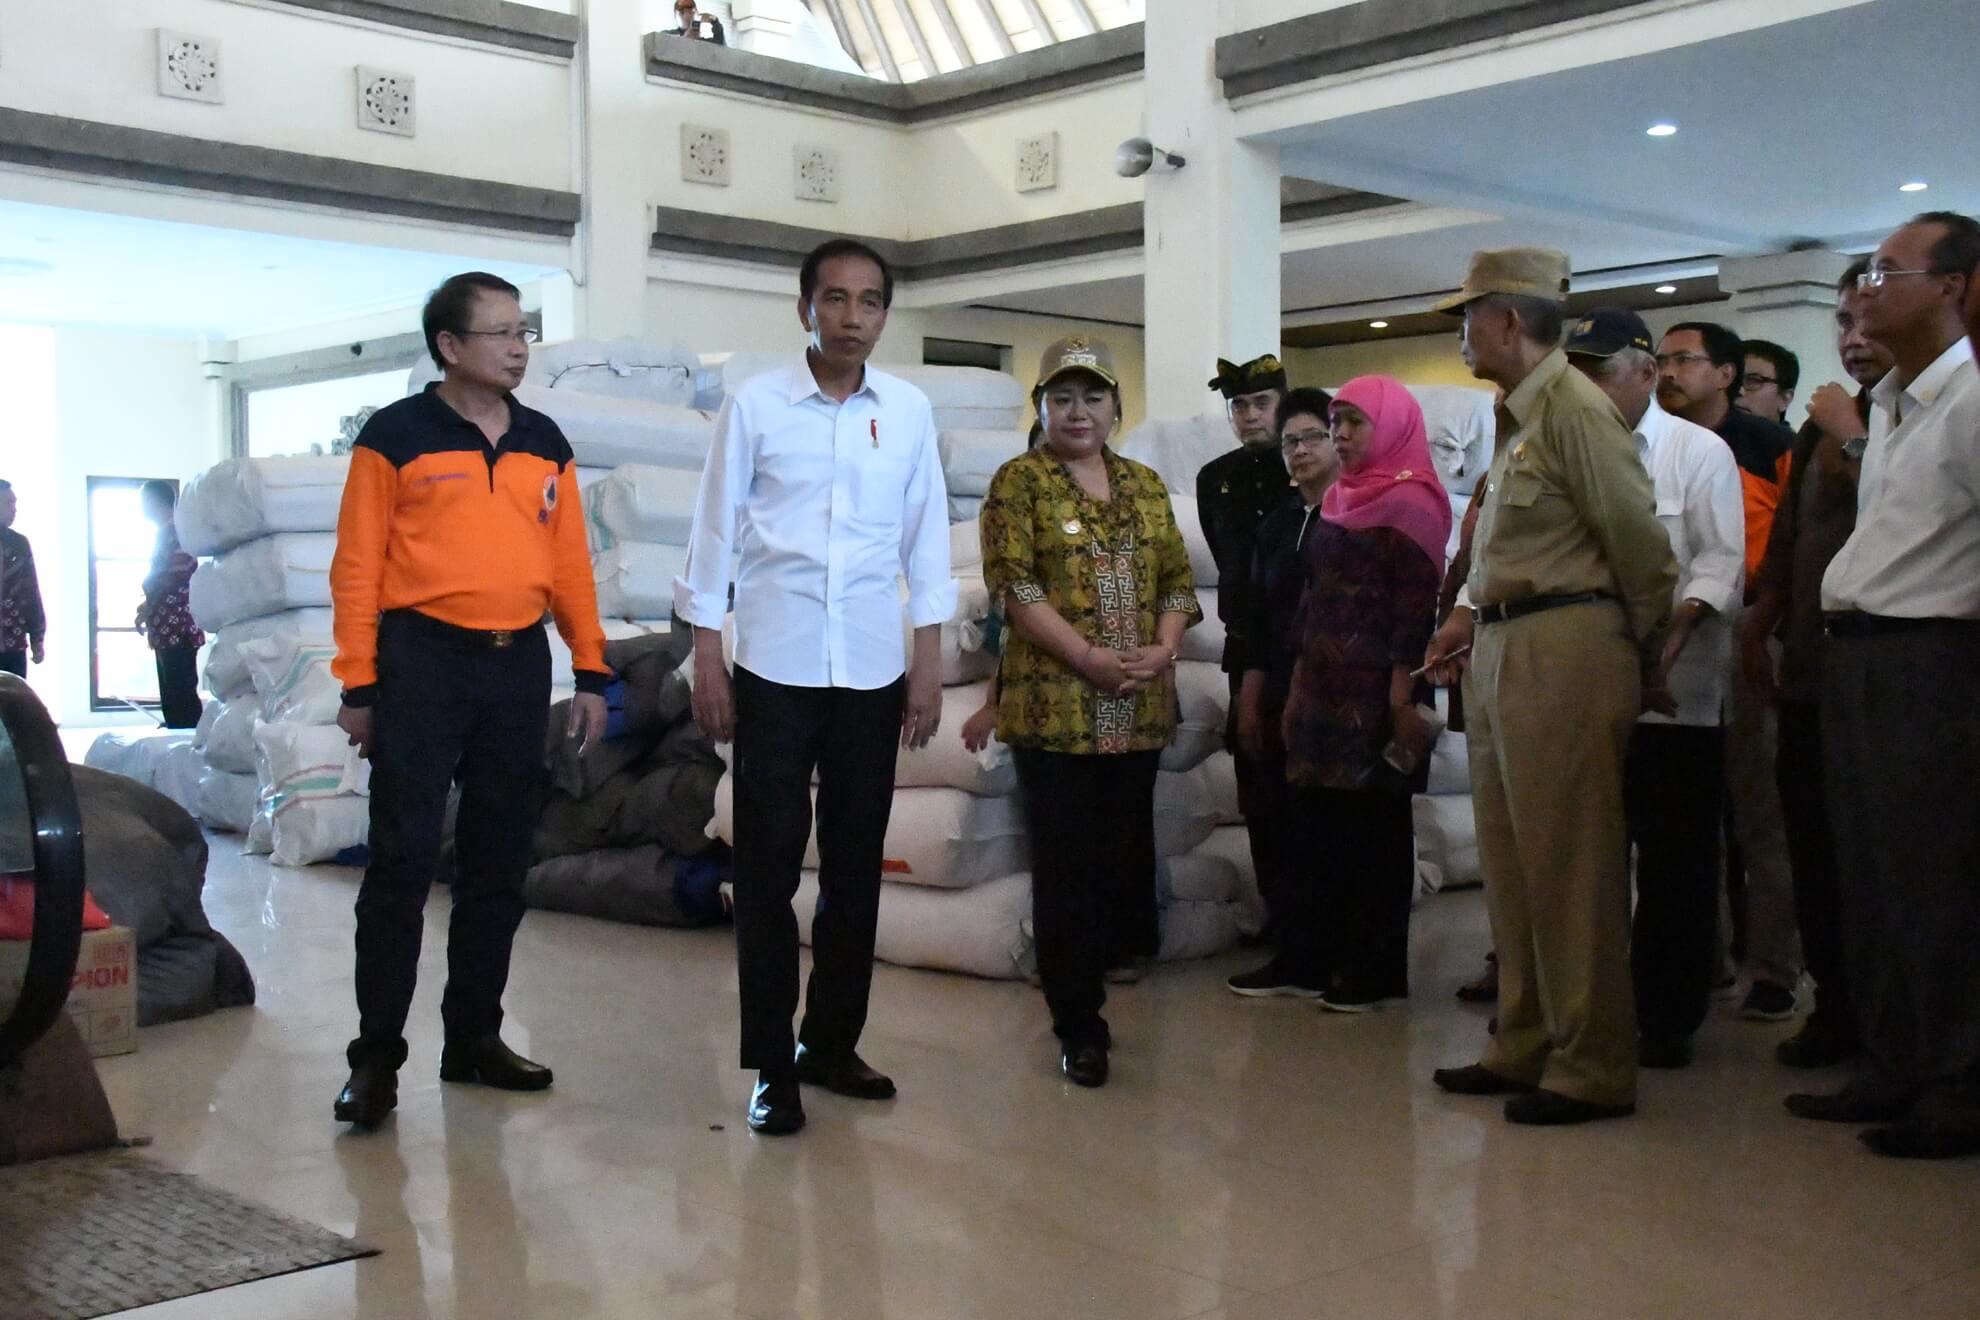 presiden-jokowi-dan-kabinet-kerja-meninjau-kesiapan-logistik-di-pos-komando-bencana-gunung-agung-desa-karangasem-jpg-3